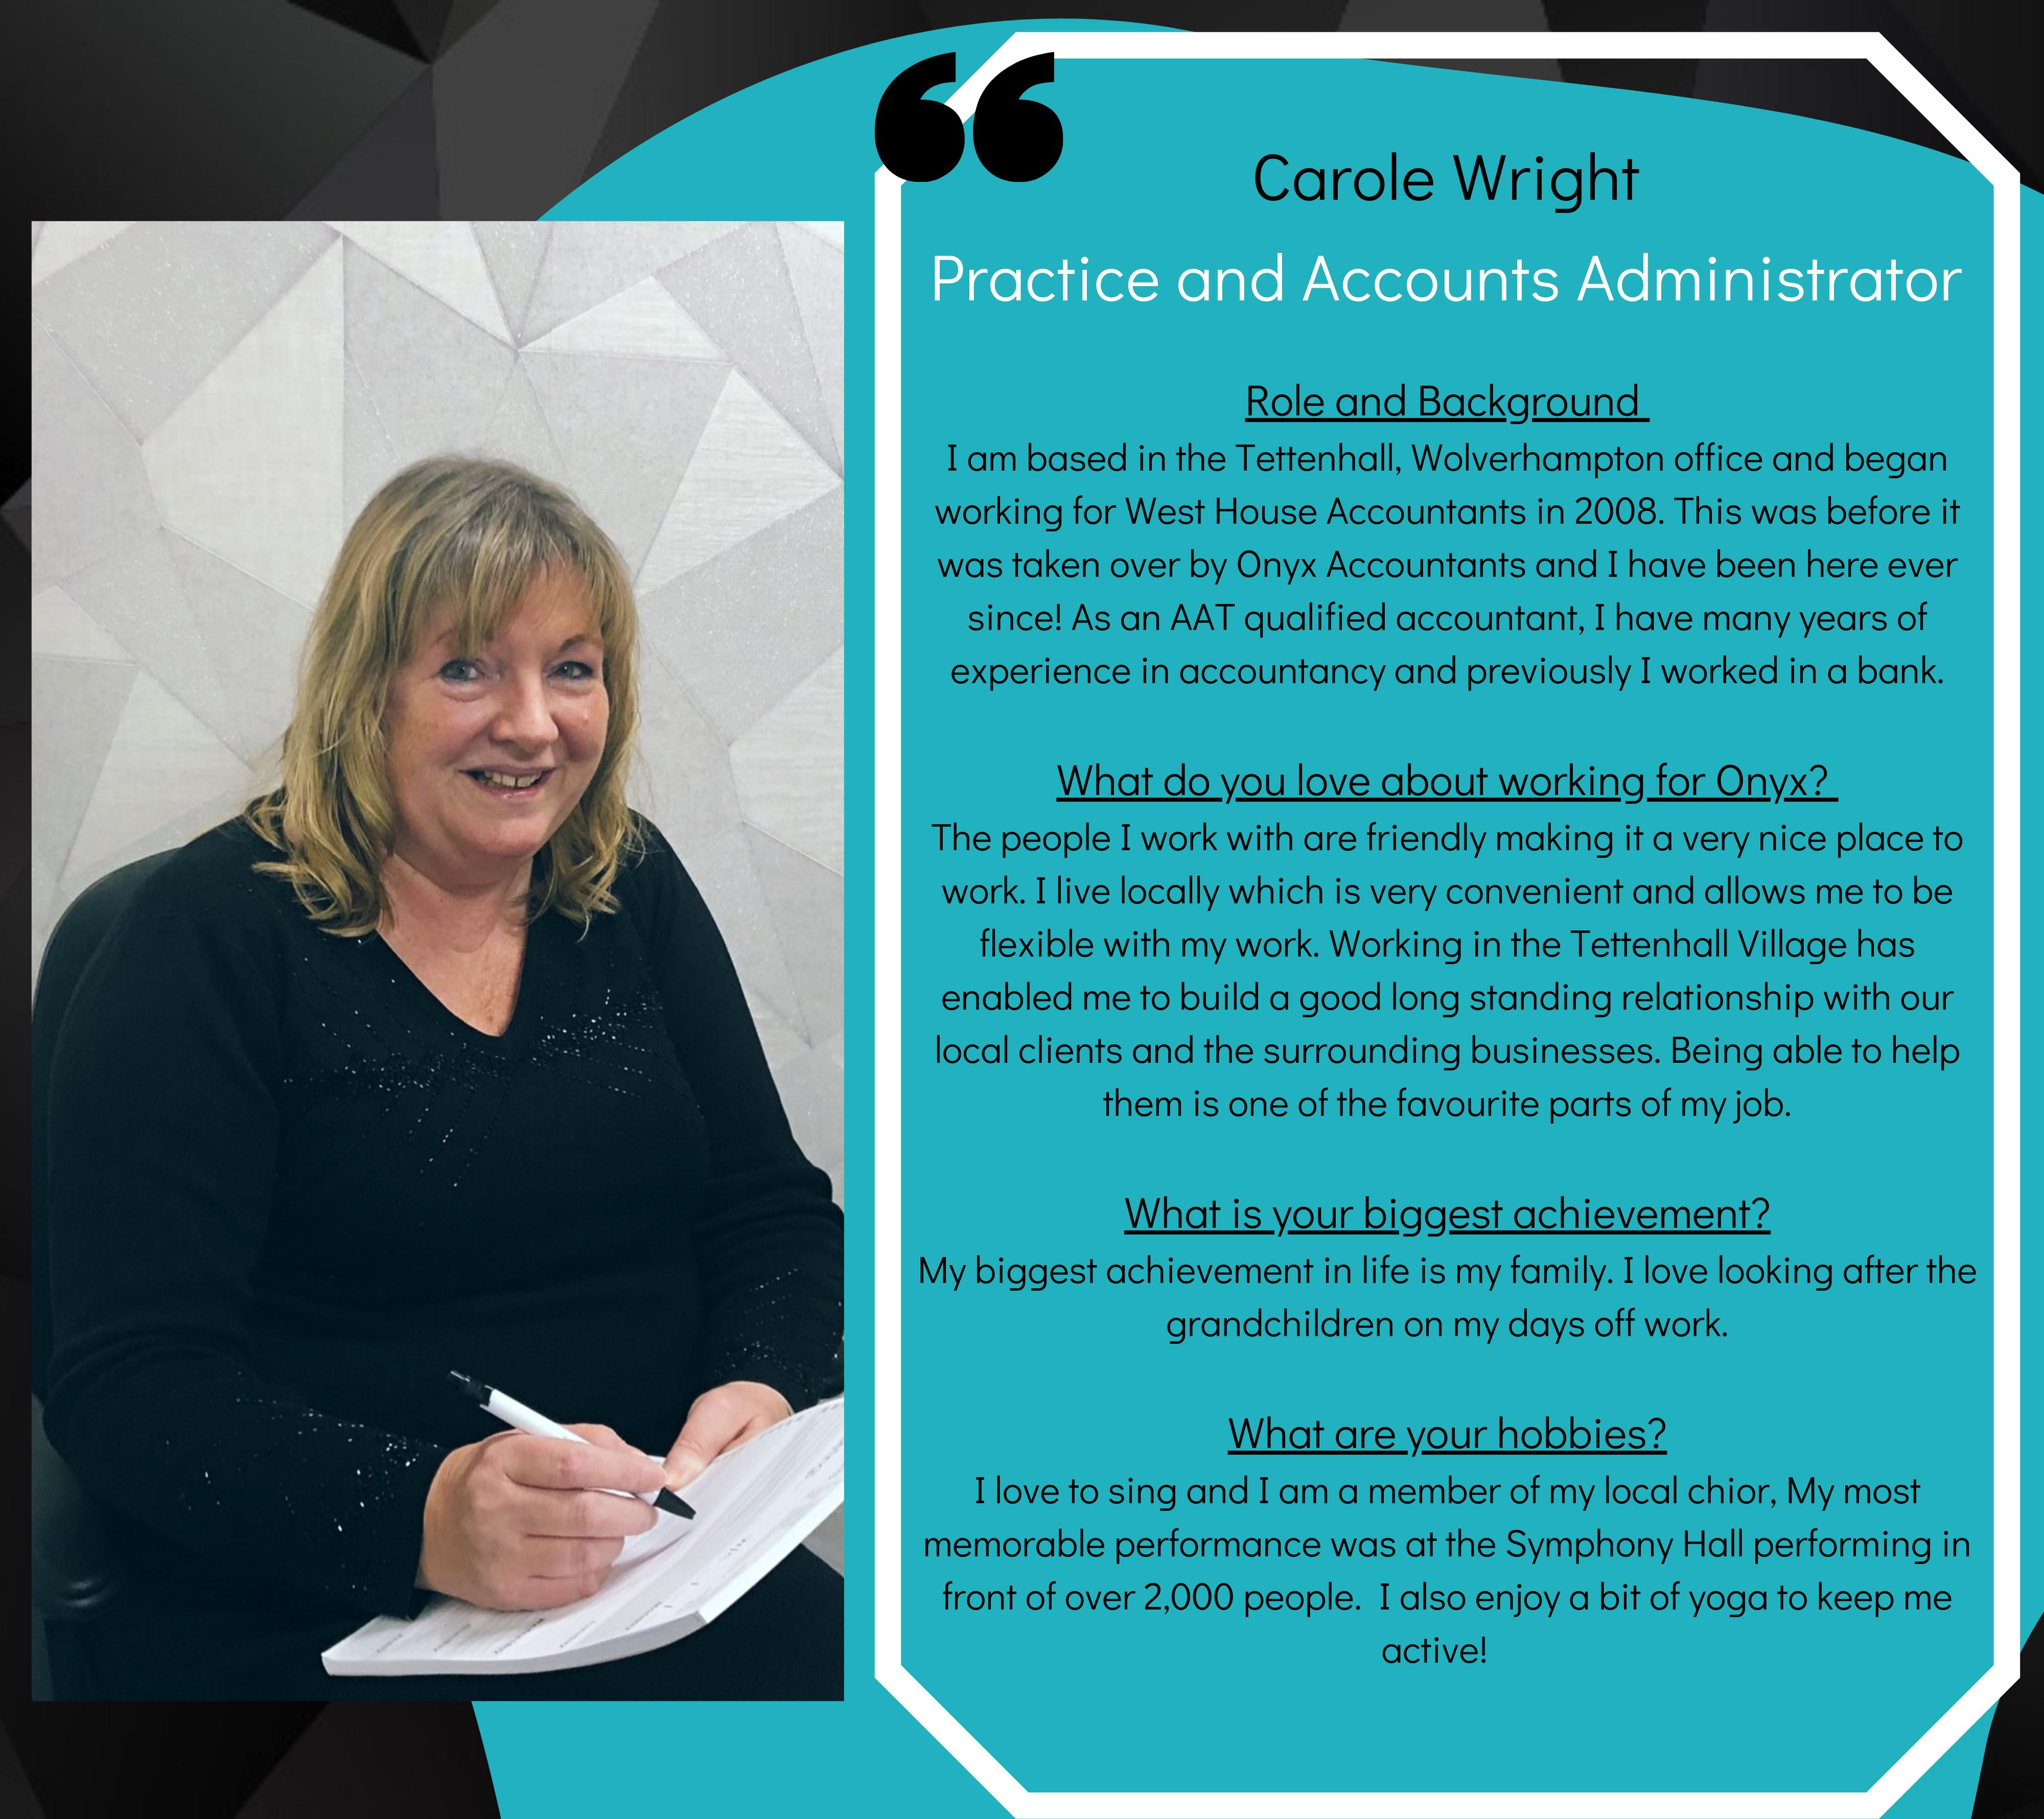 Carole Wright